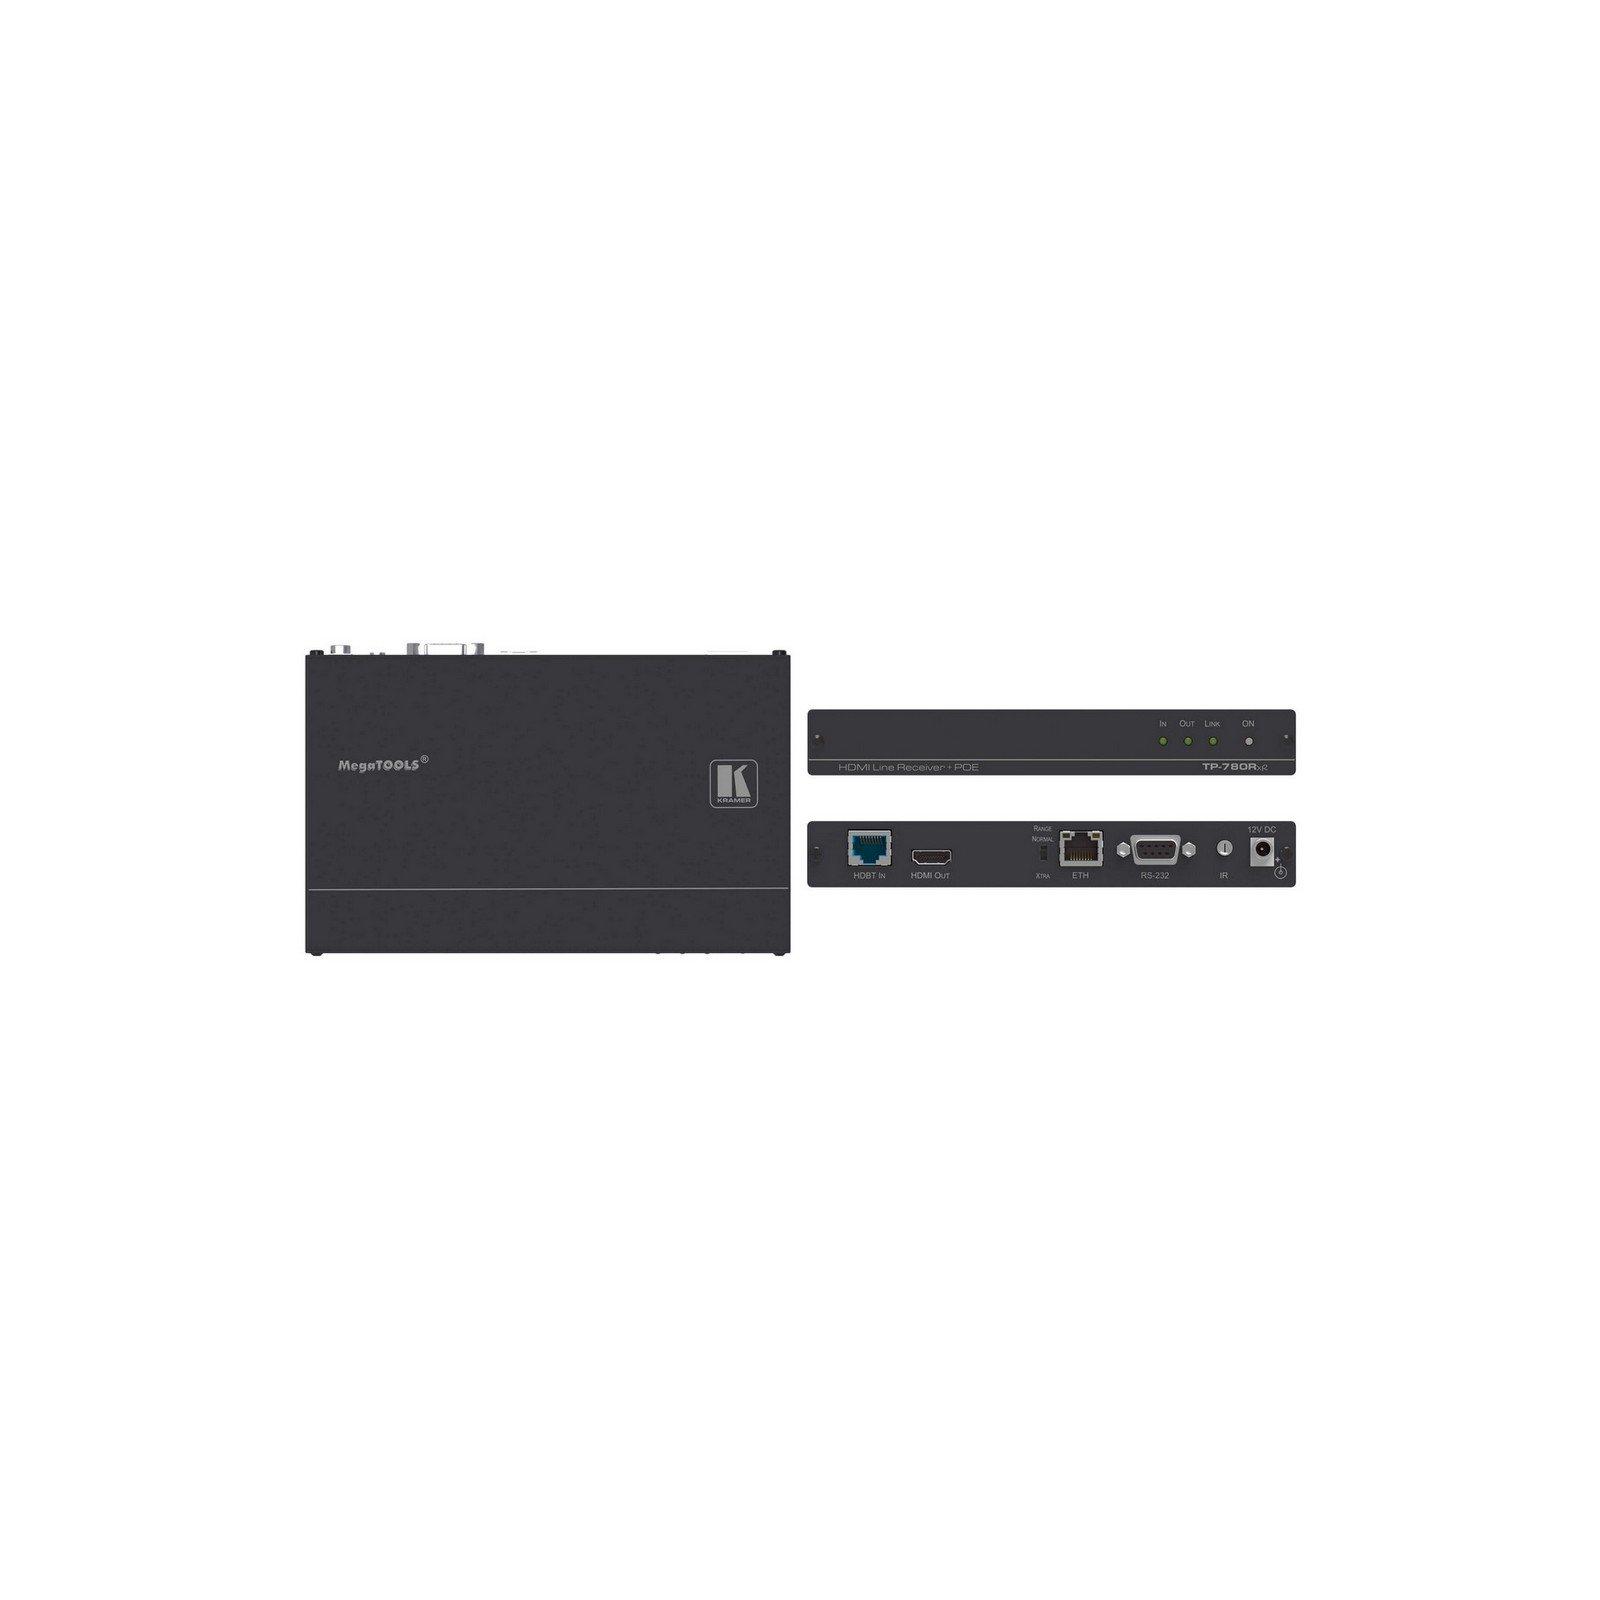 Kramer TP-780RXR   4K60 HDMI HDCP PoE HDBaseT Receiver with Ethernet